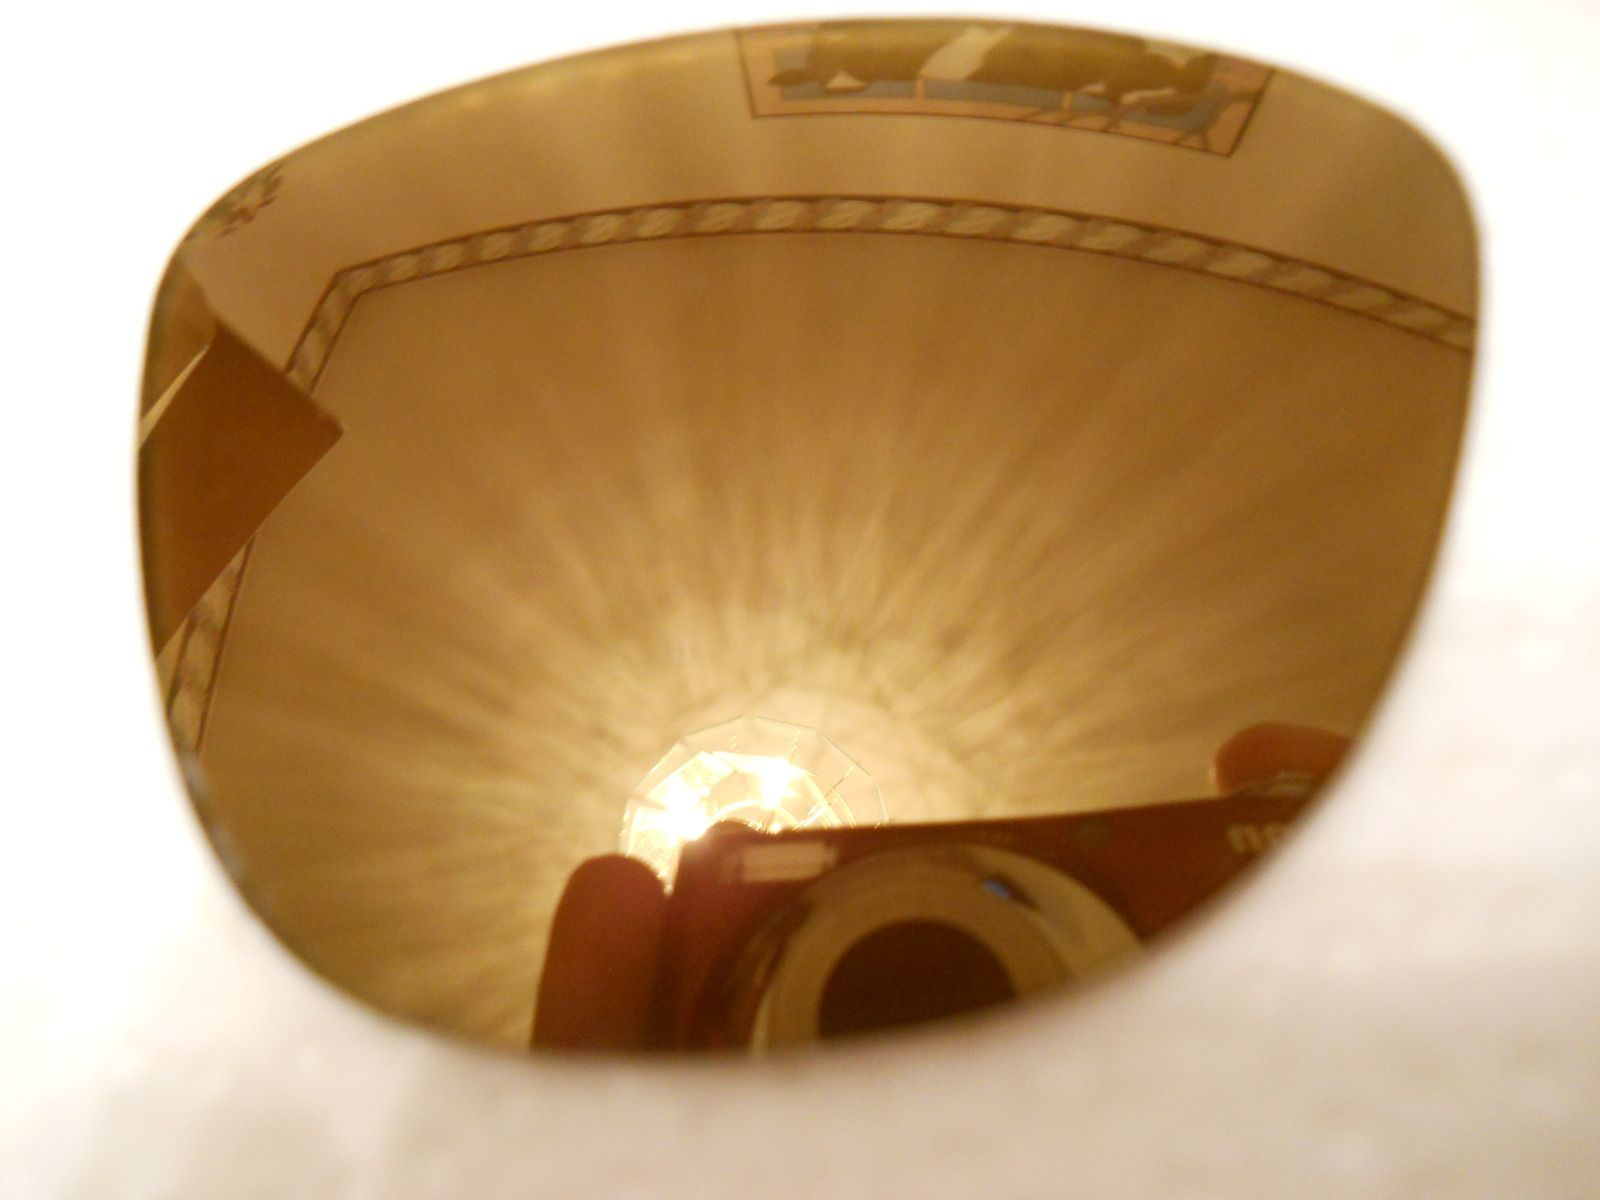 Gold Iridium Lenses (scuffed) - dscn0064vs.jpg